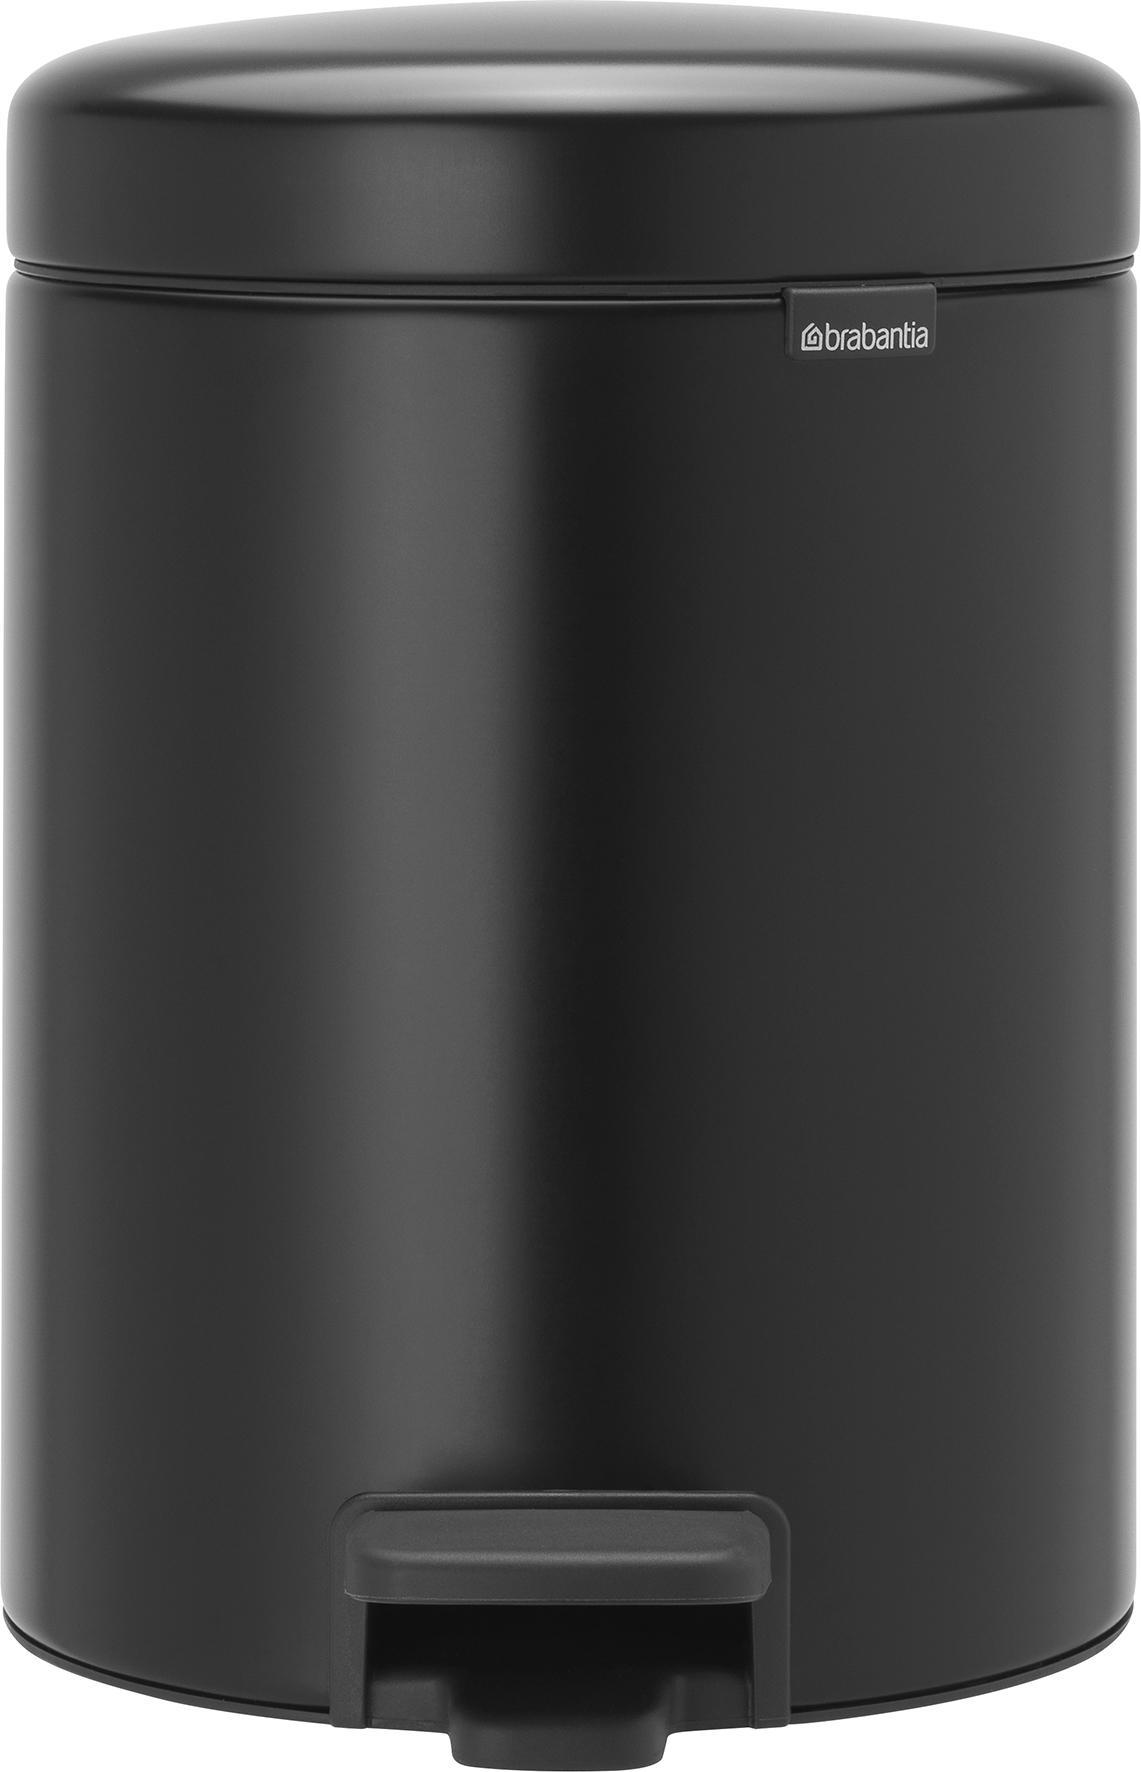 NewIcon Pedalhink M.svart 2x2L